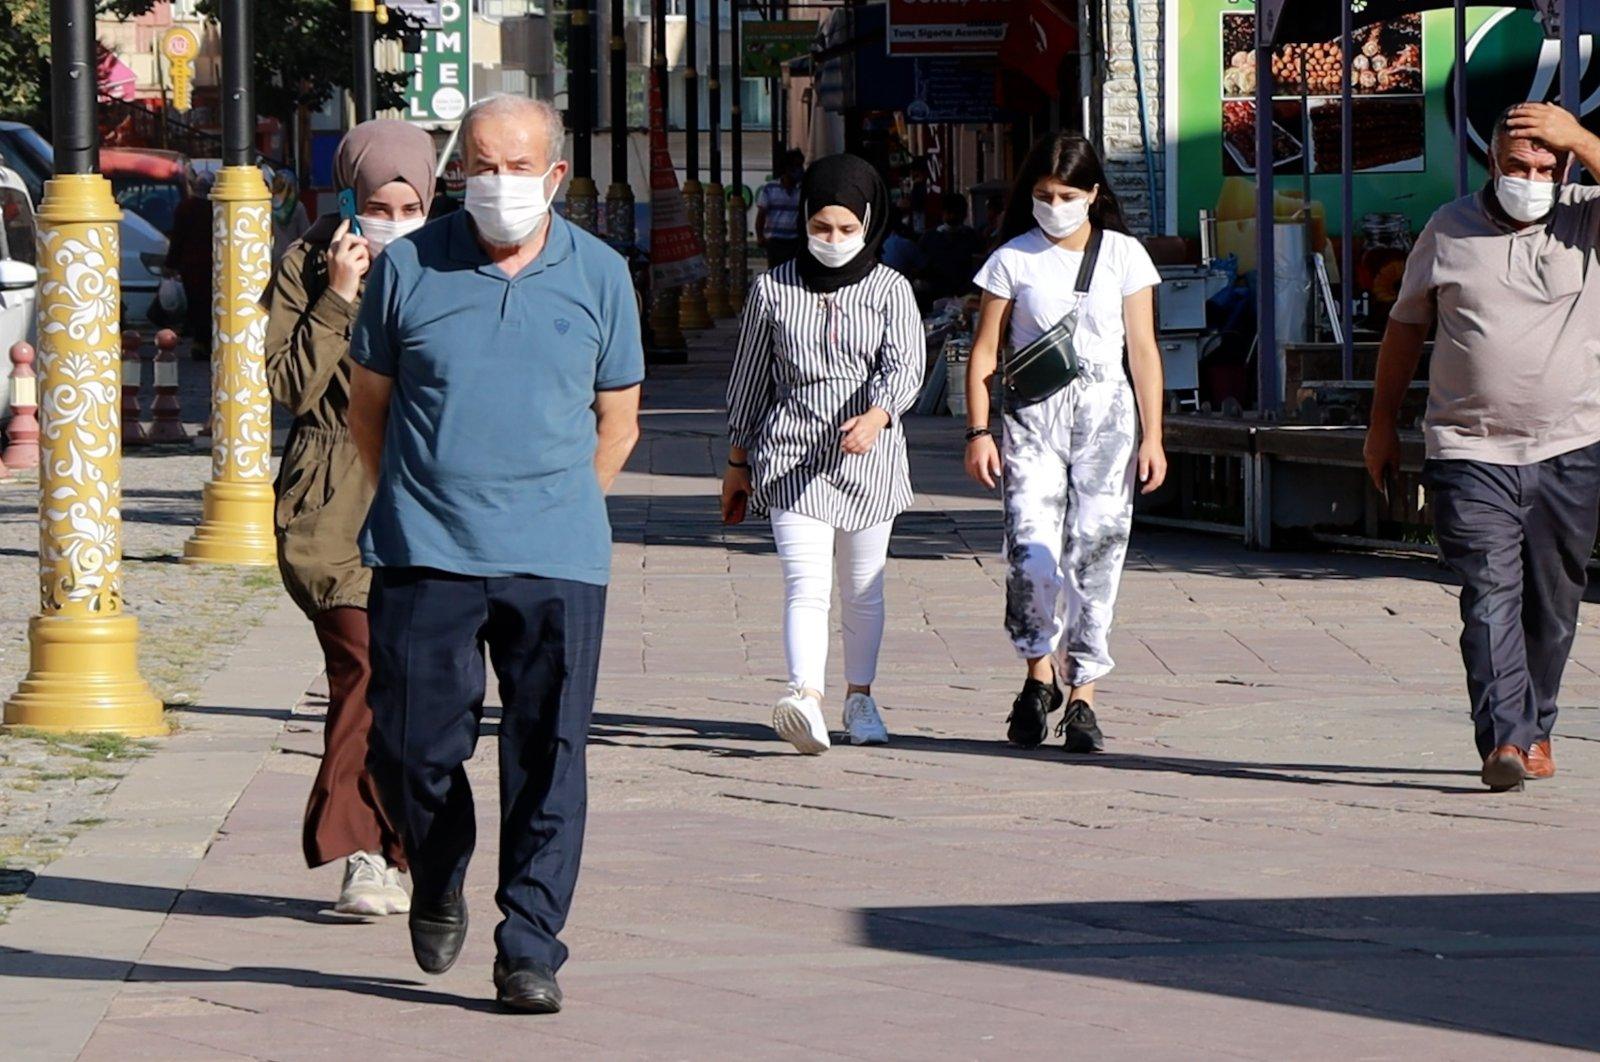 People wearing protective masks walk on a street in Gümüşhane, northern Turkey, Sept. 24, 2020. (IHA Photo)